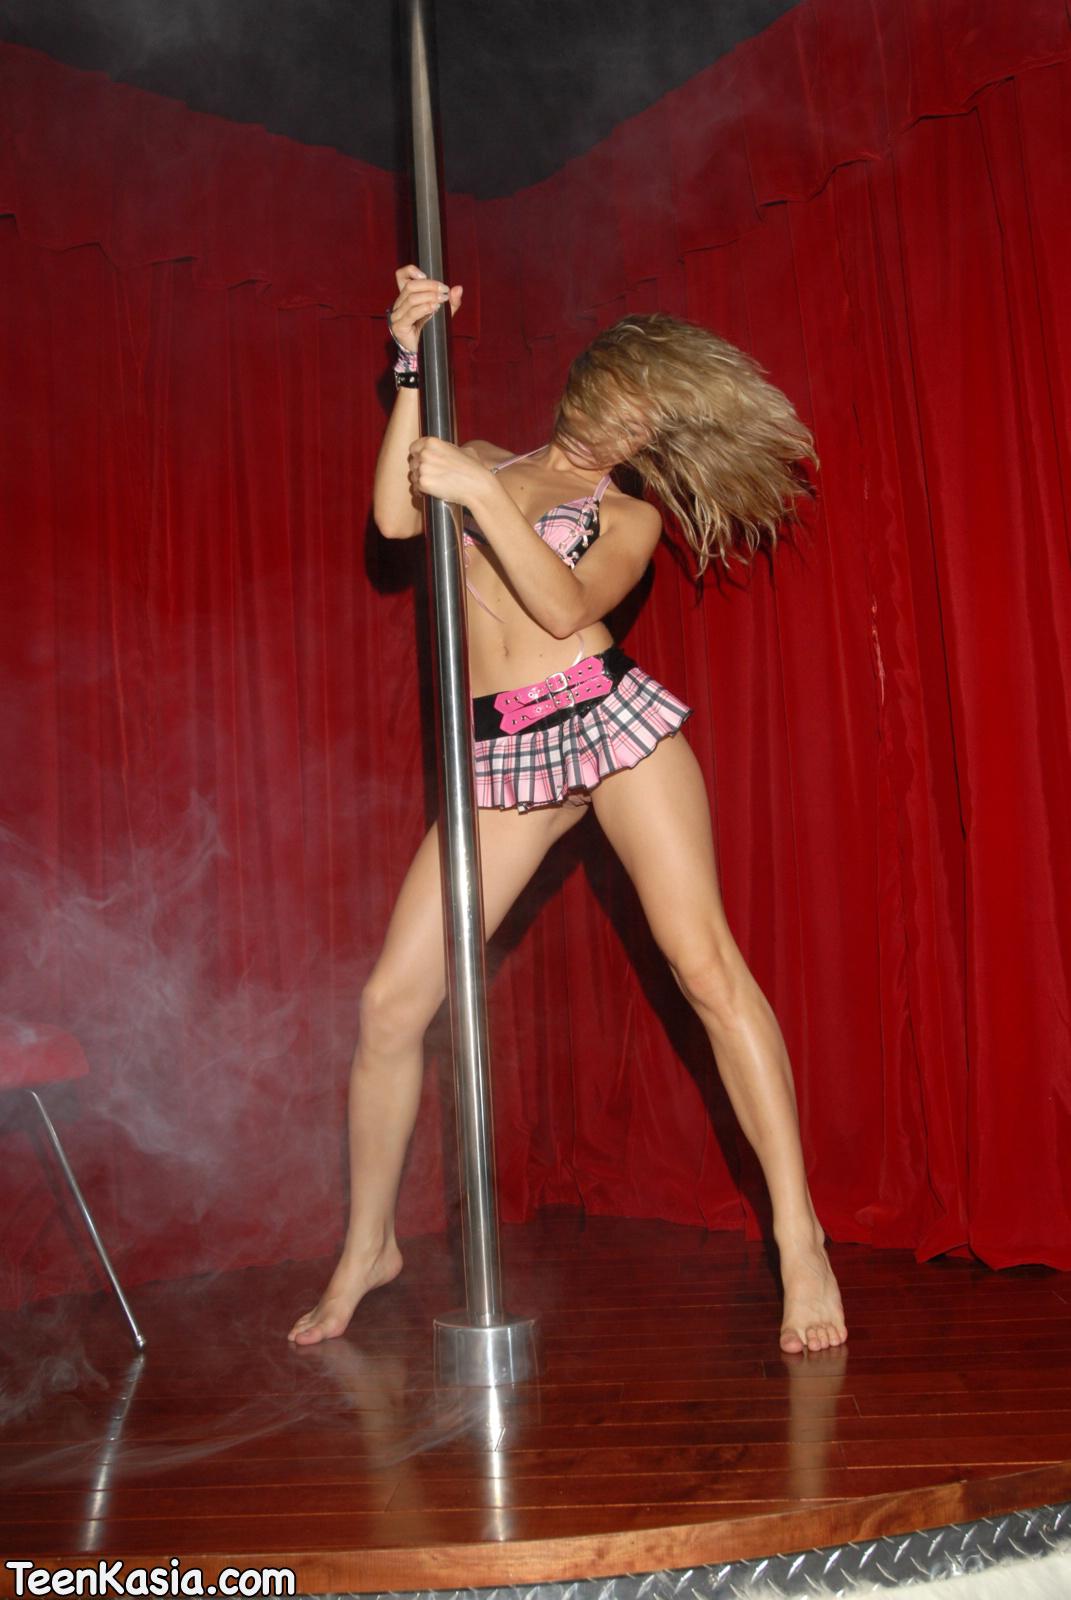 dancing Kasia nude pole